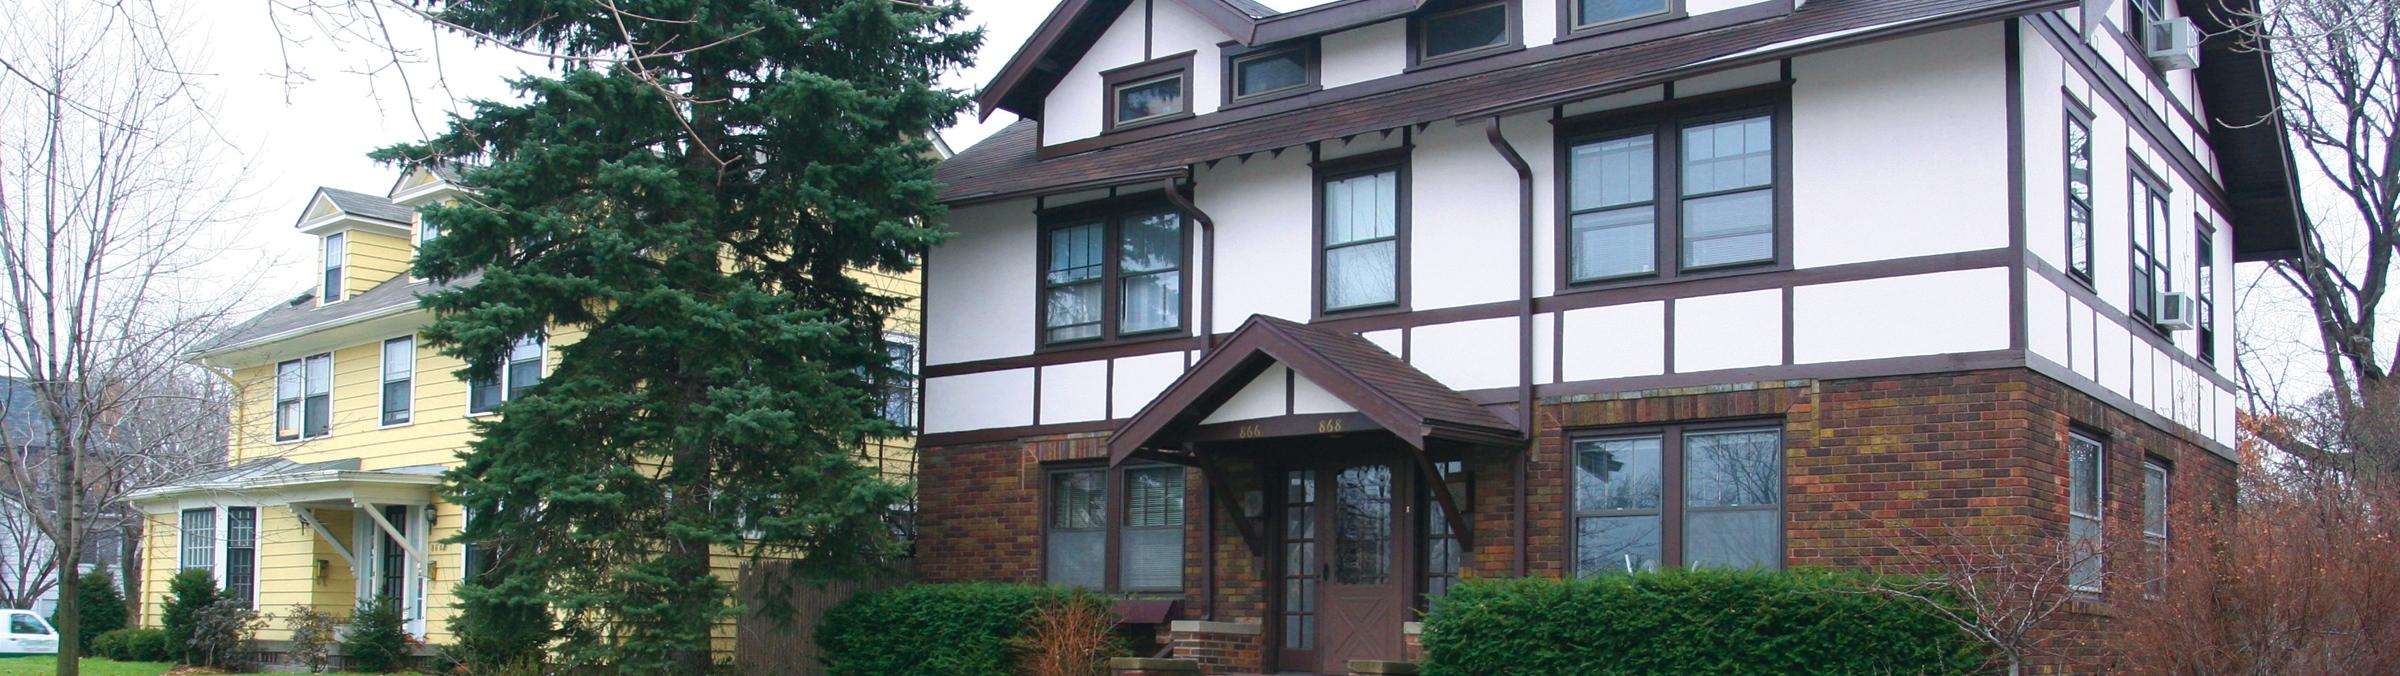 retreat-sober-houses